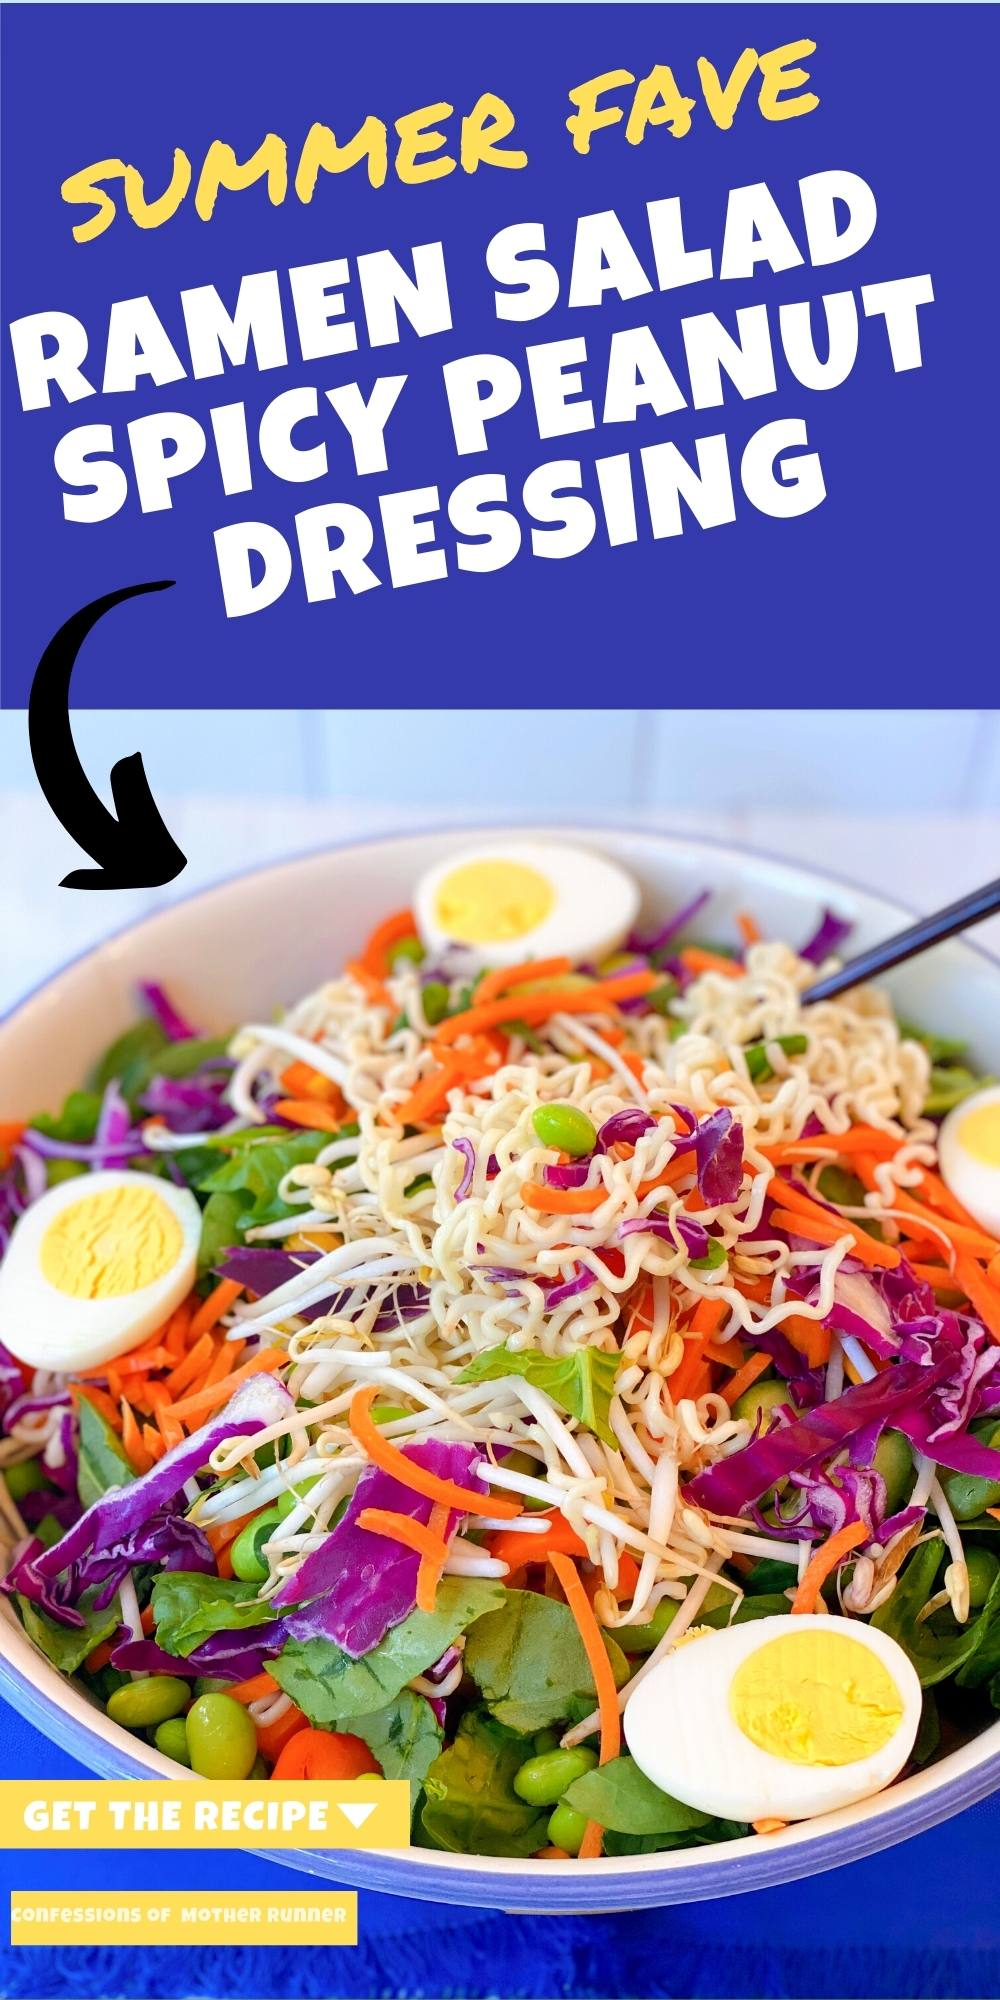 Summer Ramen Salad